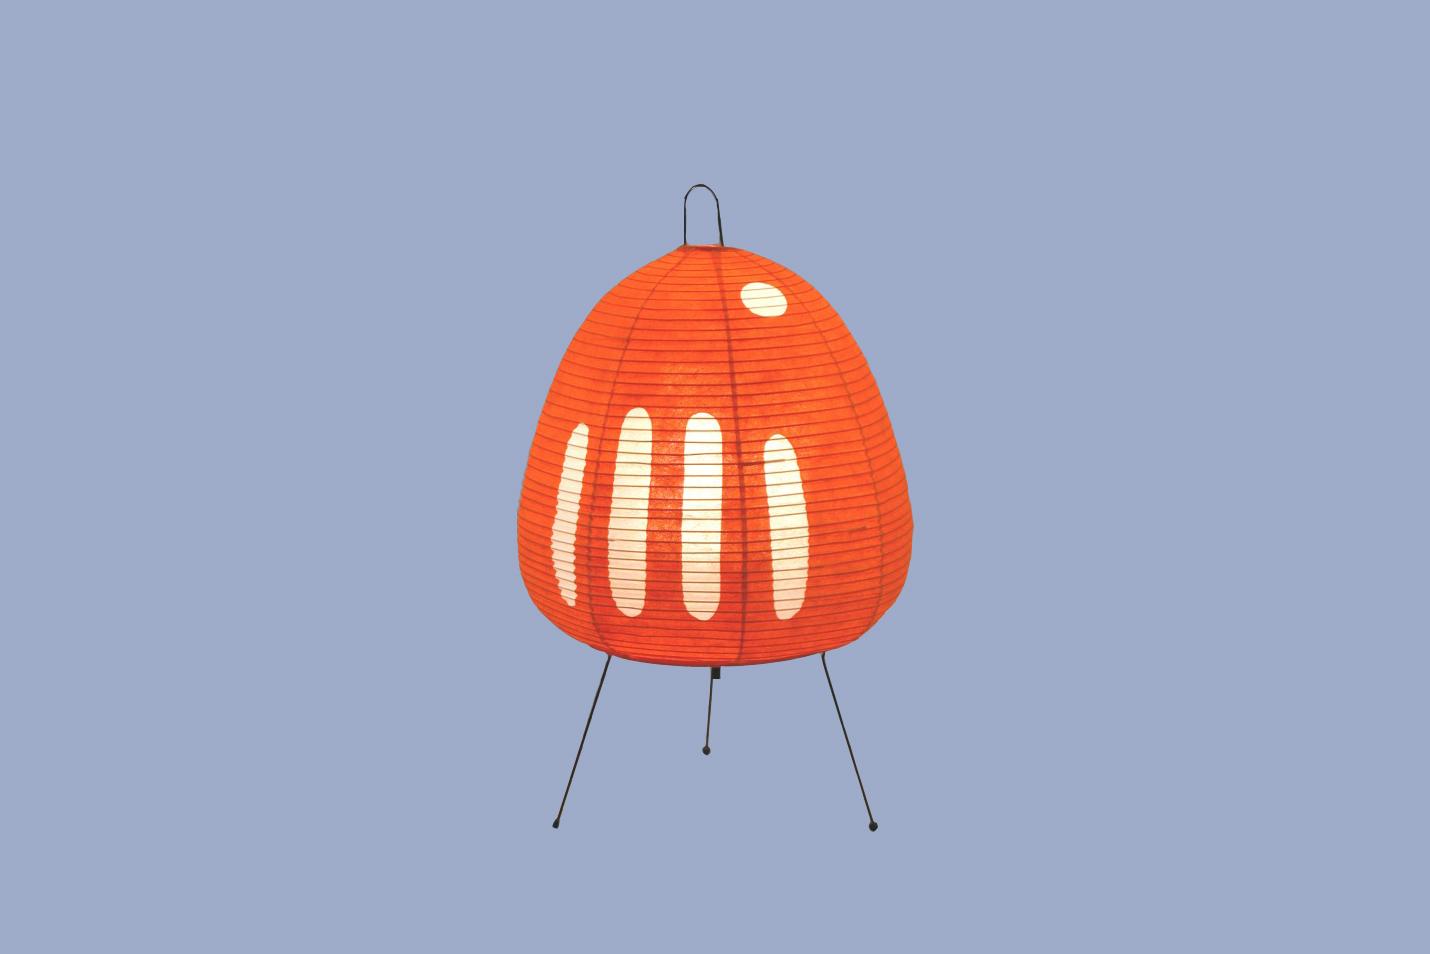 Egg-shaped orange paper lantern with white stips on thin tripod legs.